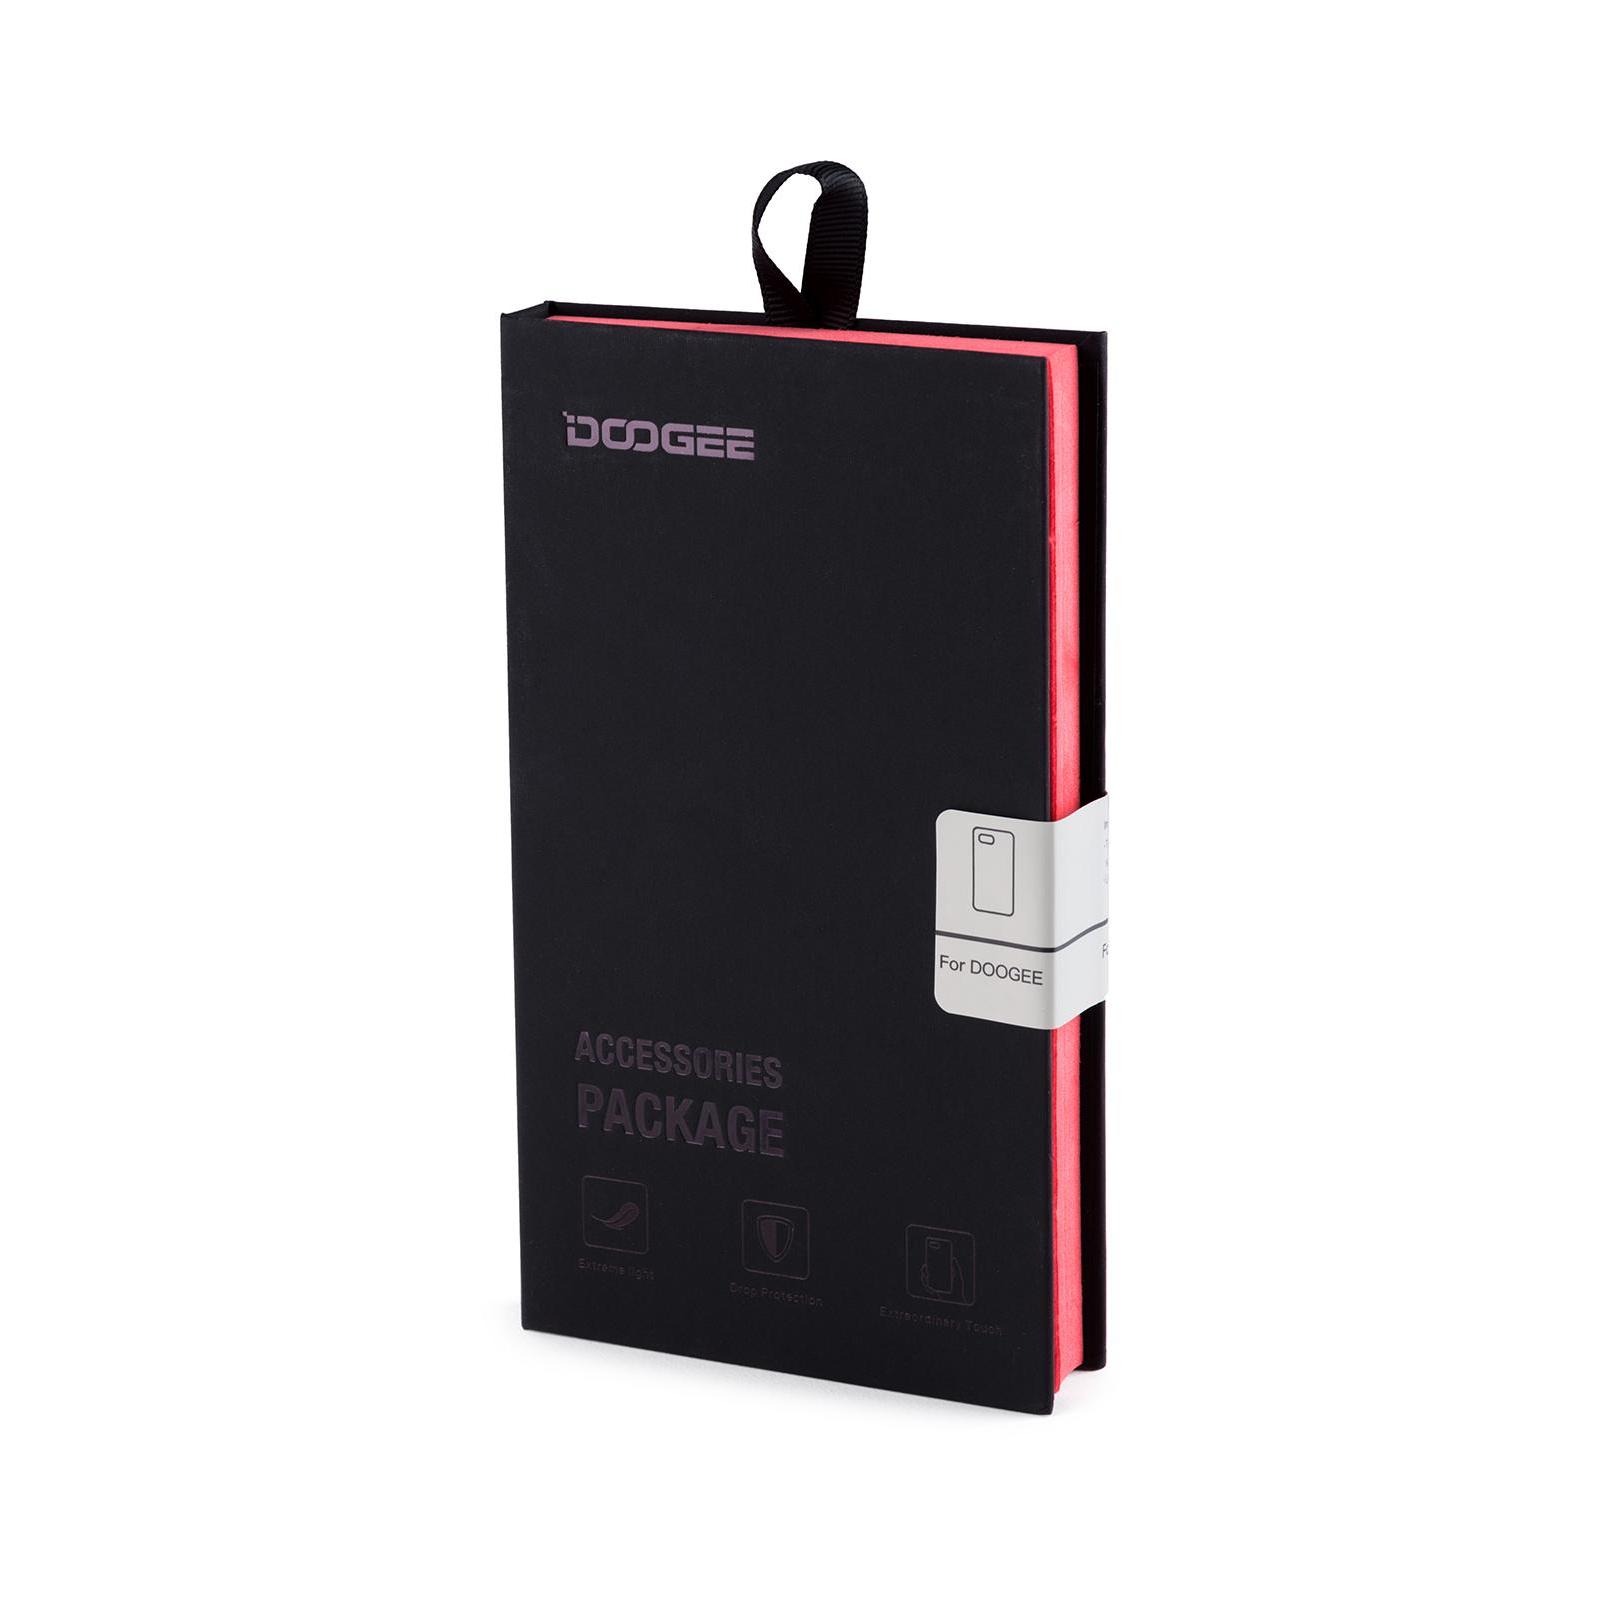 829c72918e6d0 Чехол для моб. телефона Doogee MIX Lite Package (Black) (DGA66-BC009 ...